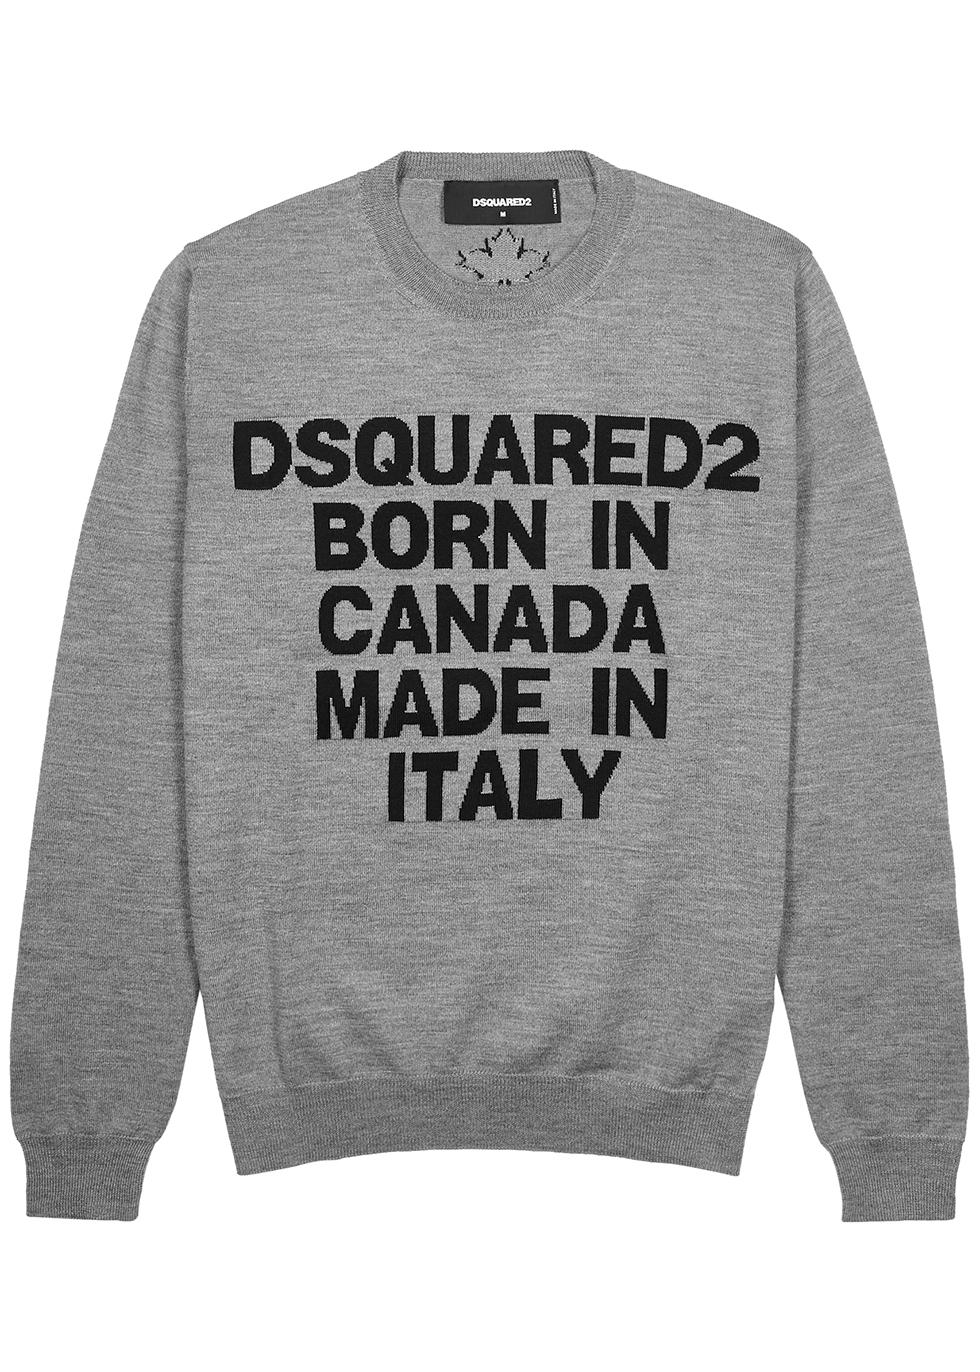 3f0c9b612 Dsquared Jeans, Trainers, T-Shirts - Harvey Nichols